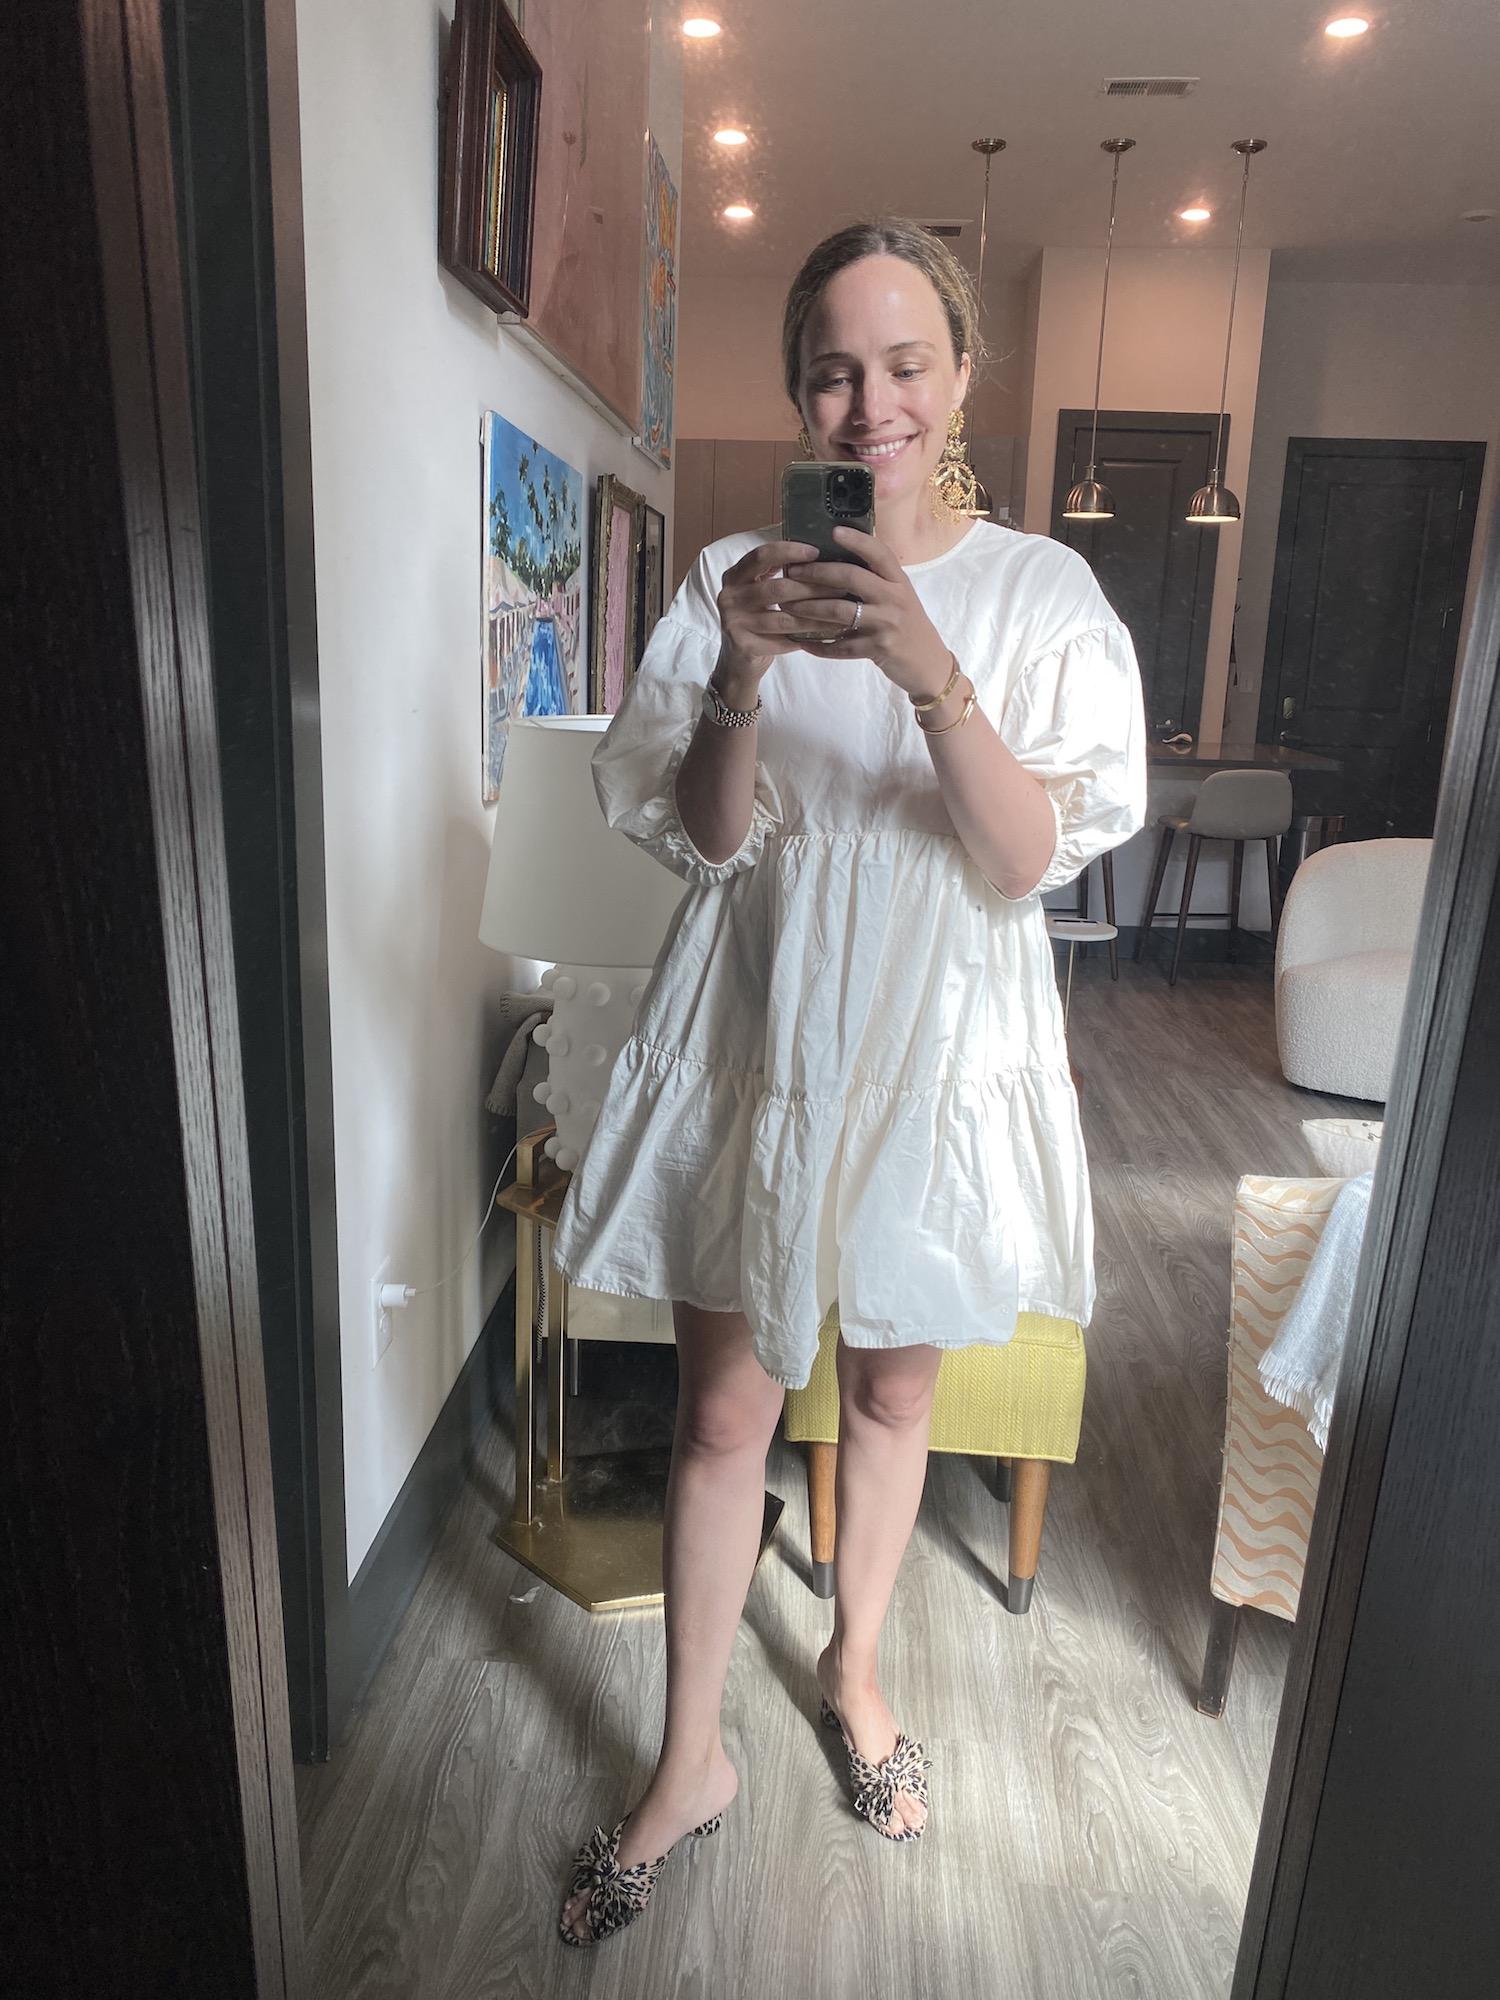 Loeffler Randall leopard heels | A Week of Outfits 5.19.21